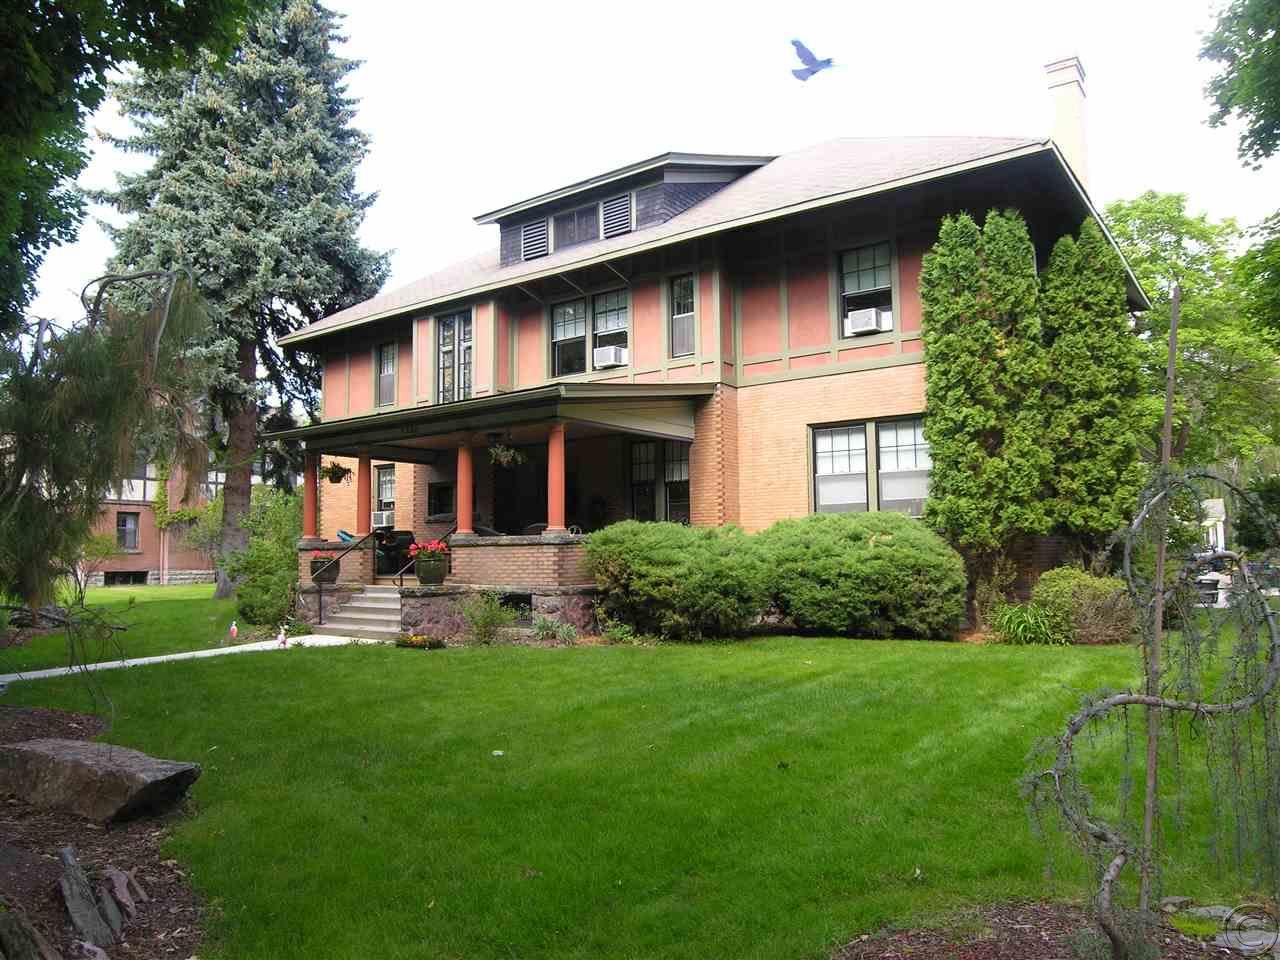 Real Estate for Sale, ListingId: 33797292, Missoula,MT59801